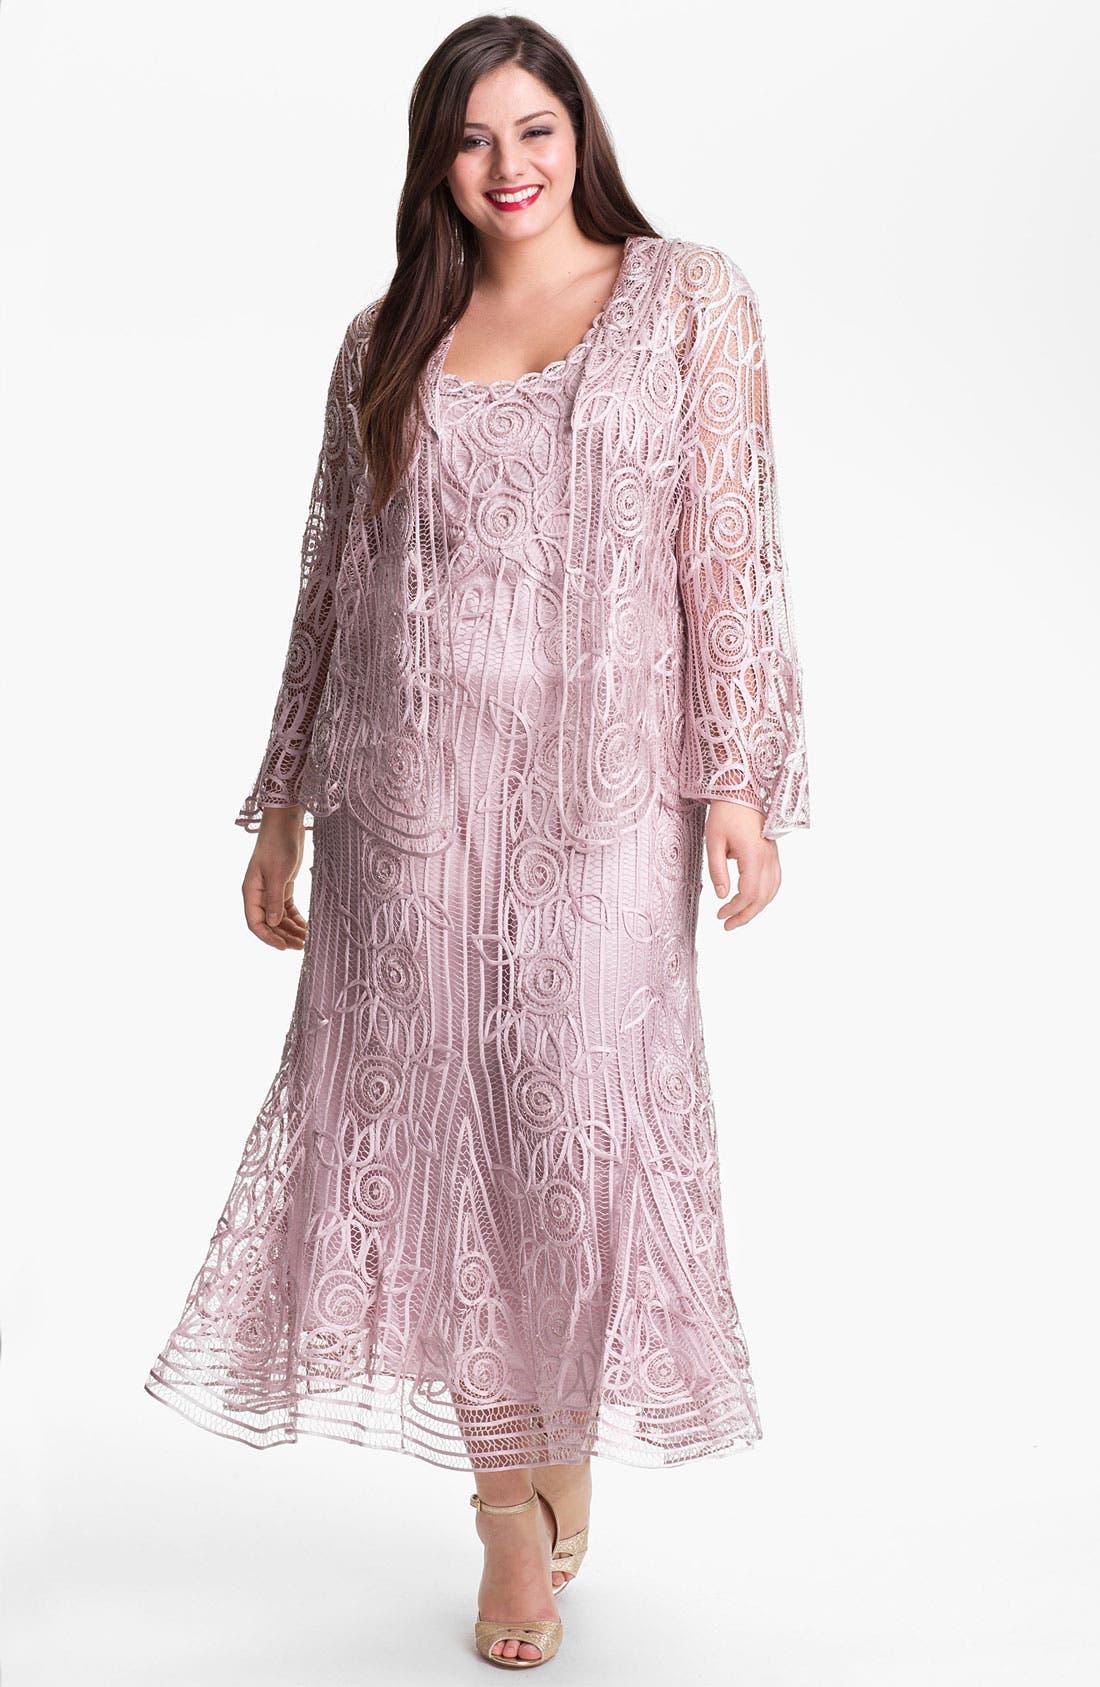 Main Image - Soulmates Ribbon Silk Dress & Jacket (Plus Size)